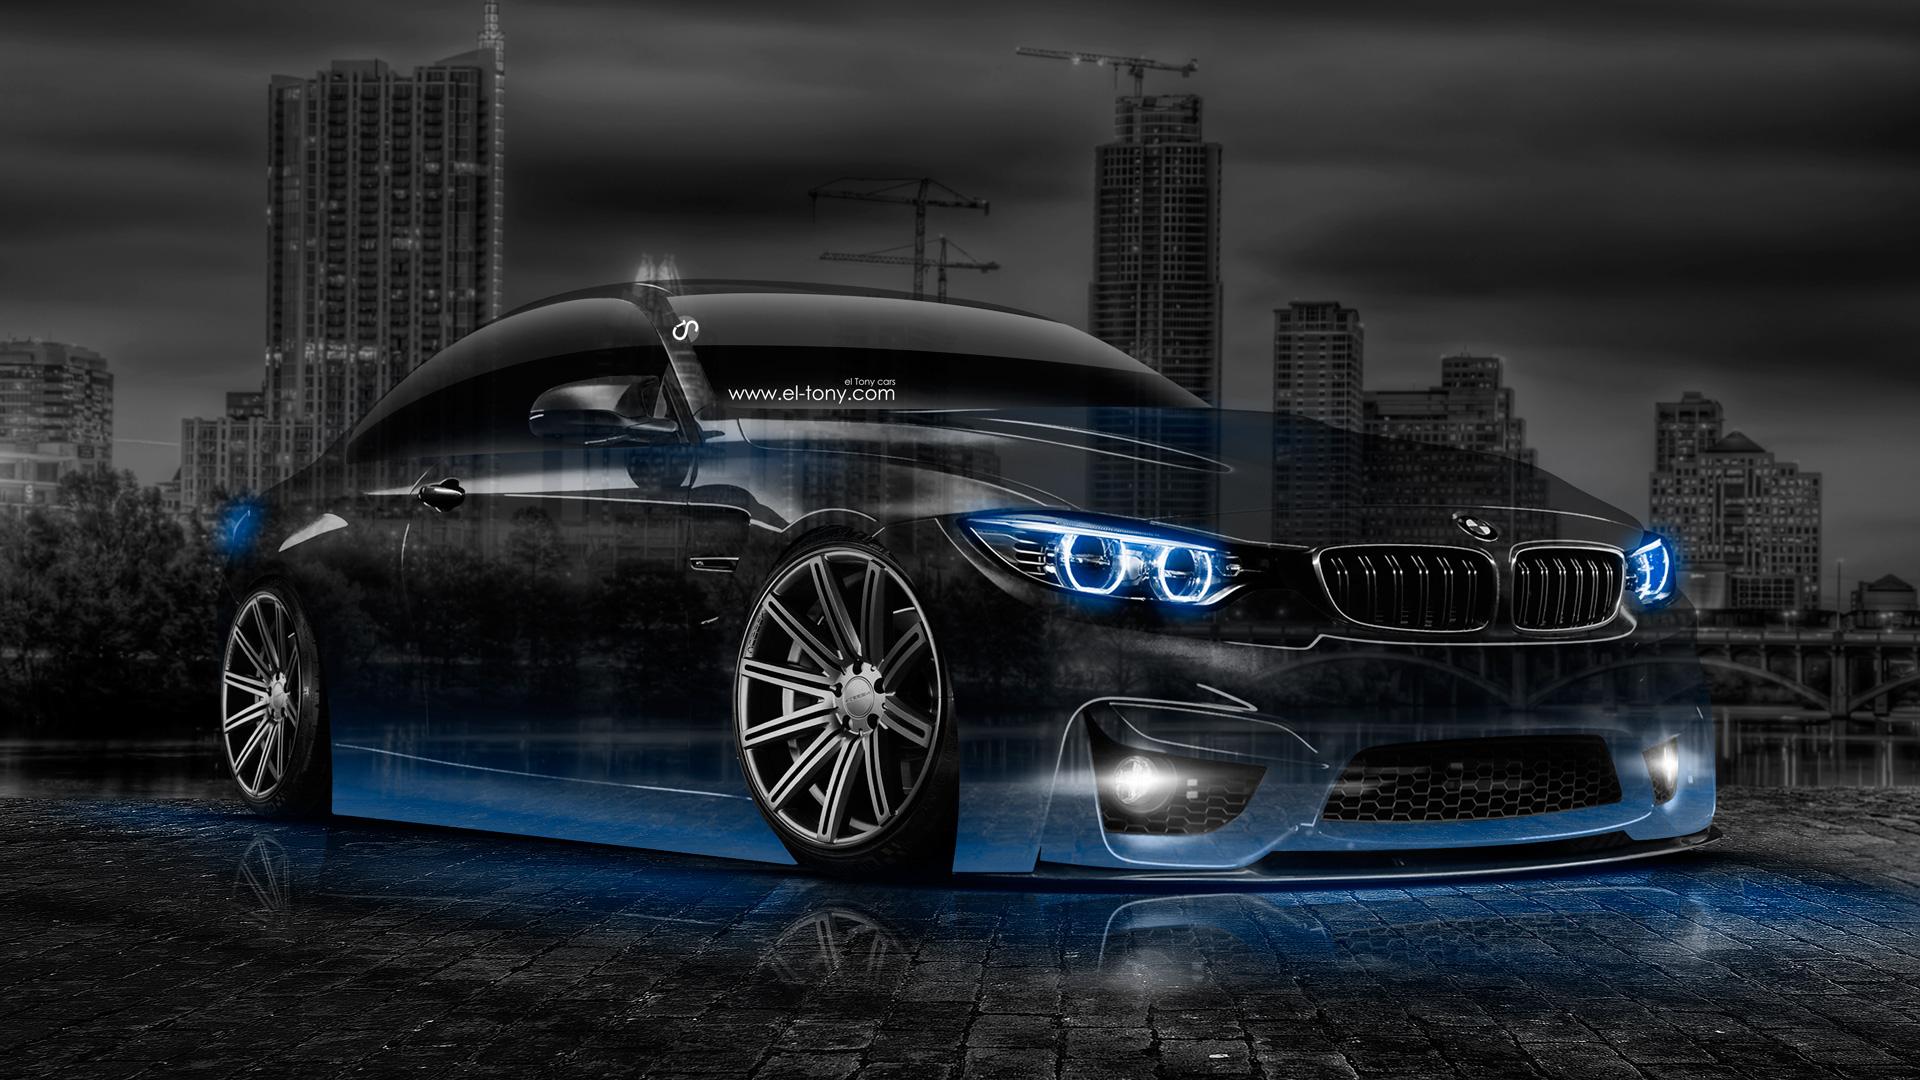 48+ BMW M4 HD Wallpaper on WallpaperSafari